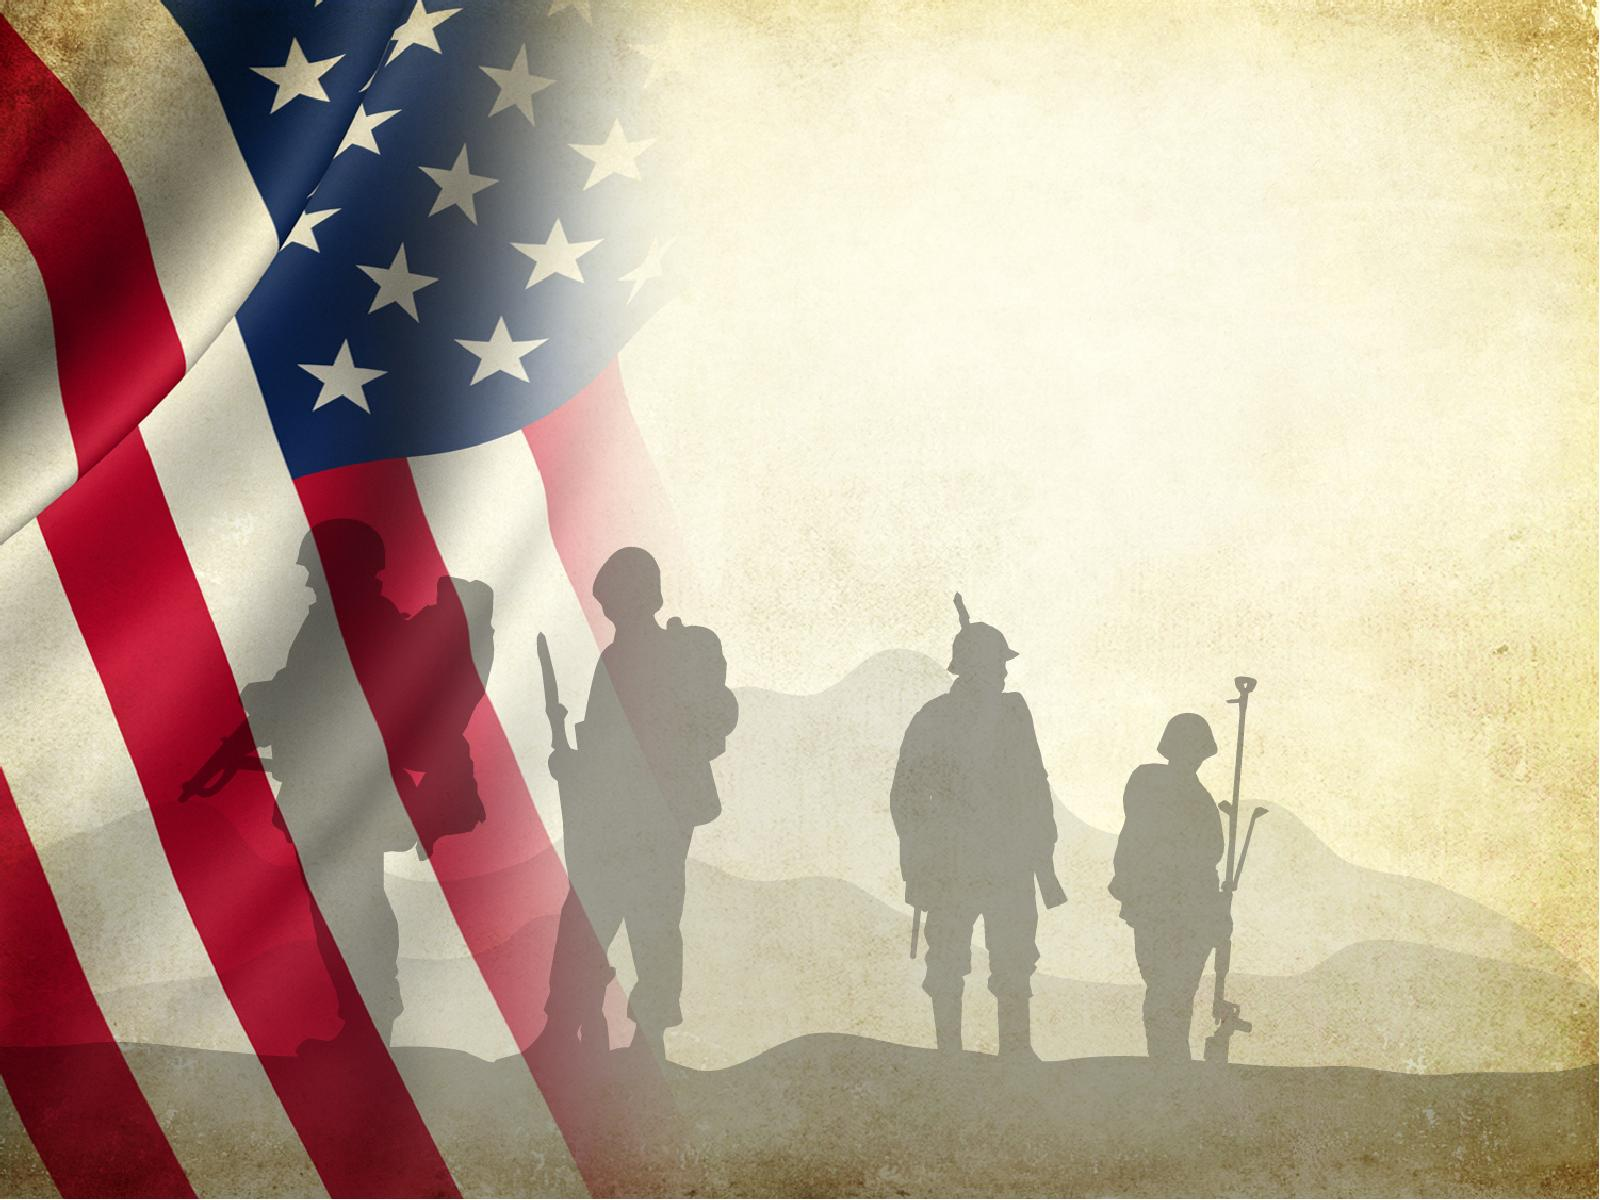 Elevate Marketing expresses thankfulness to veterans